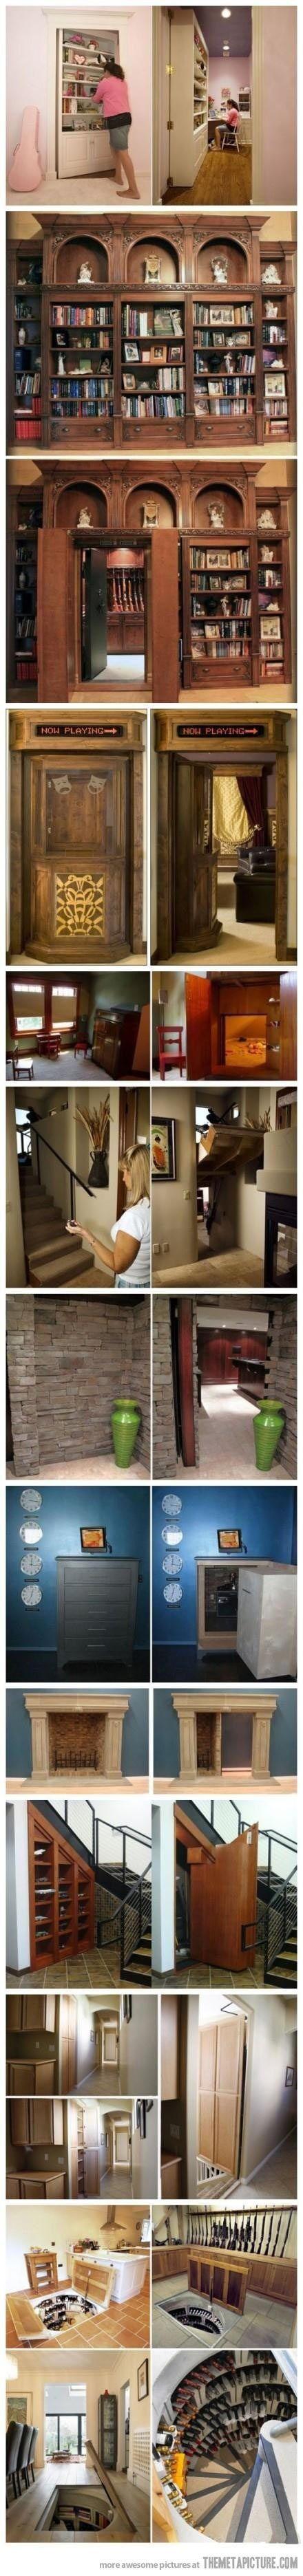 Houses with secret doors!